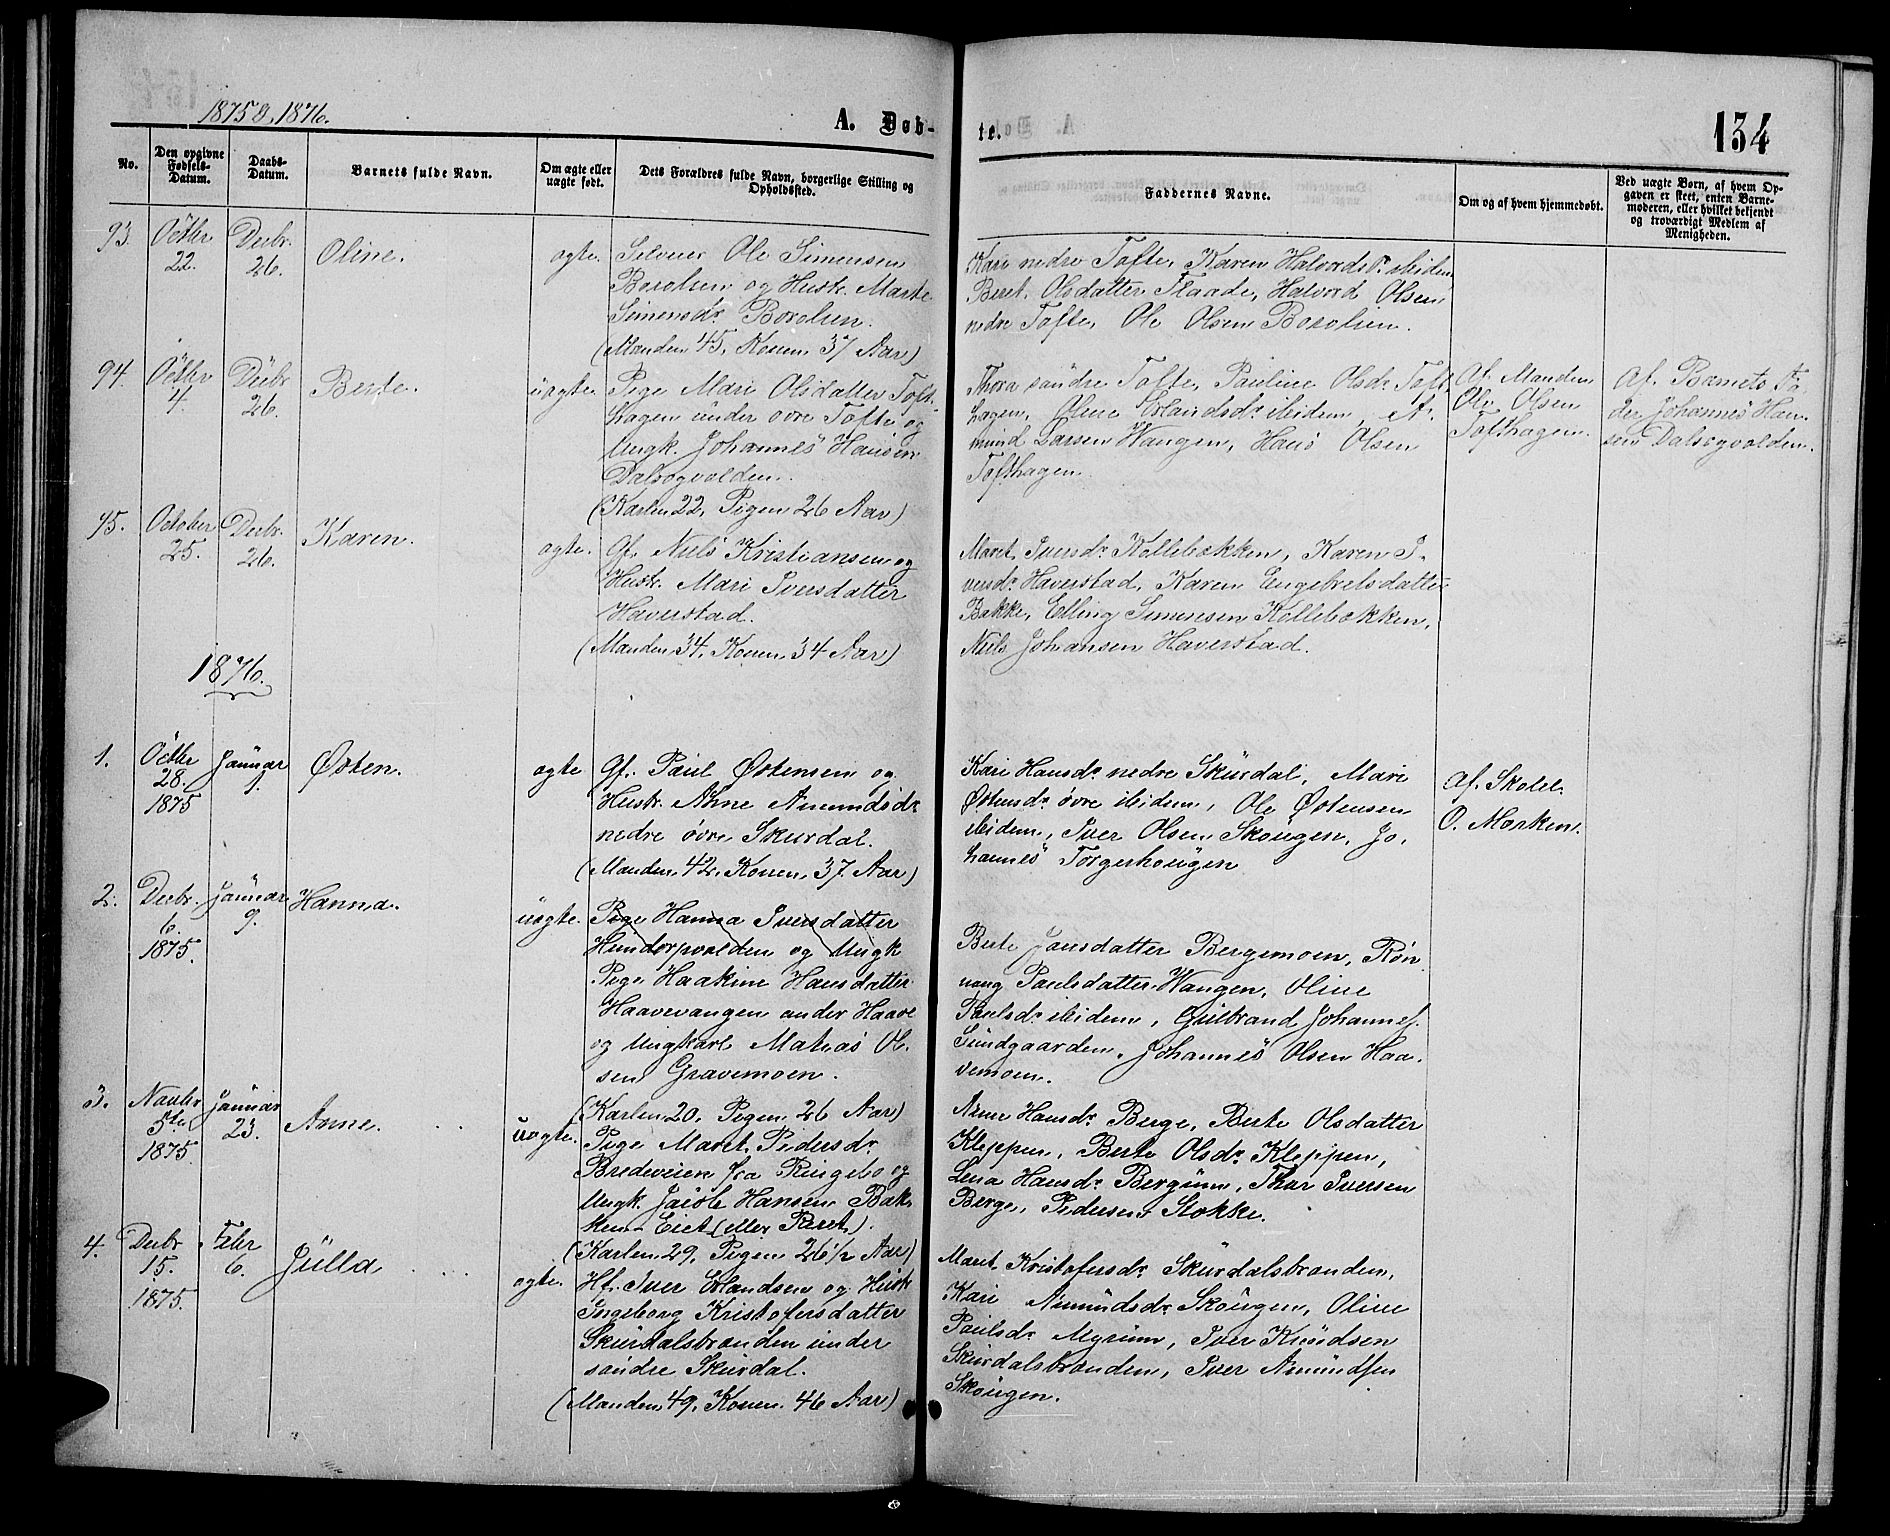 SAH, Sør-Fron prestekontor, H/Ha/Hab/L0002: Klokkerbok nr. 2, 1864-1883, s. 134